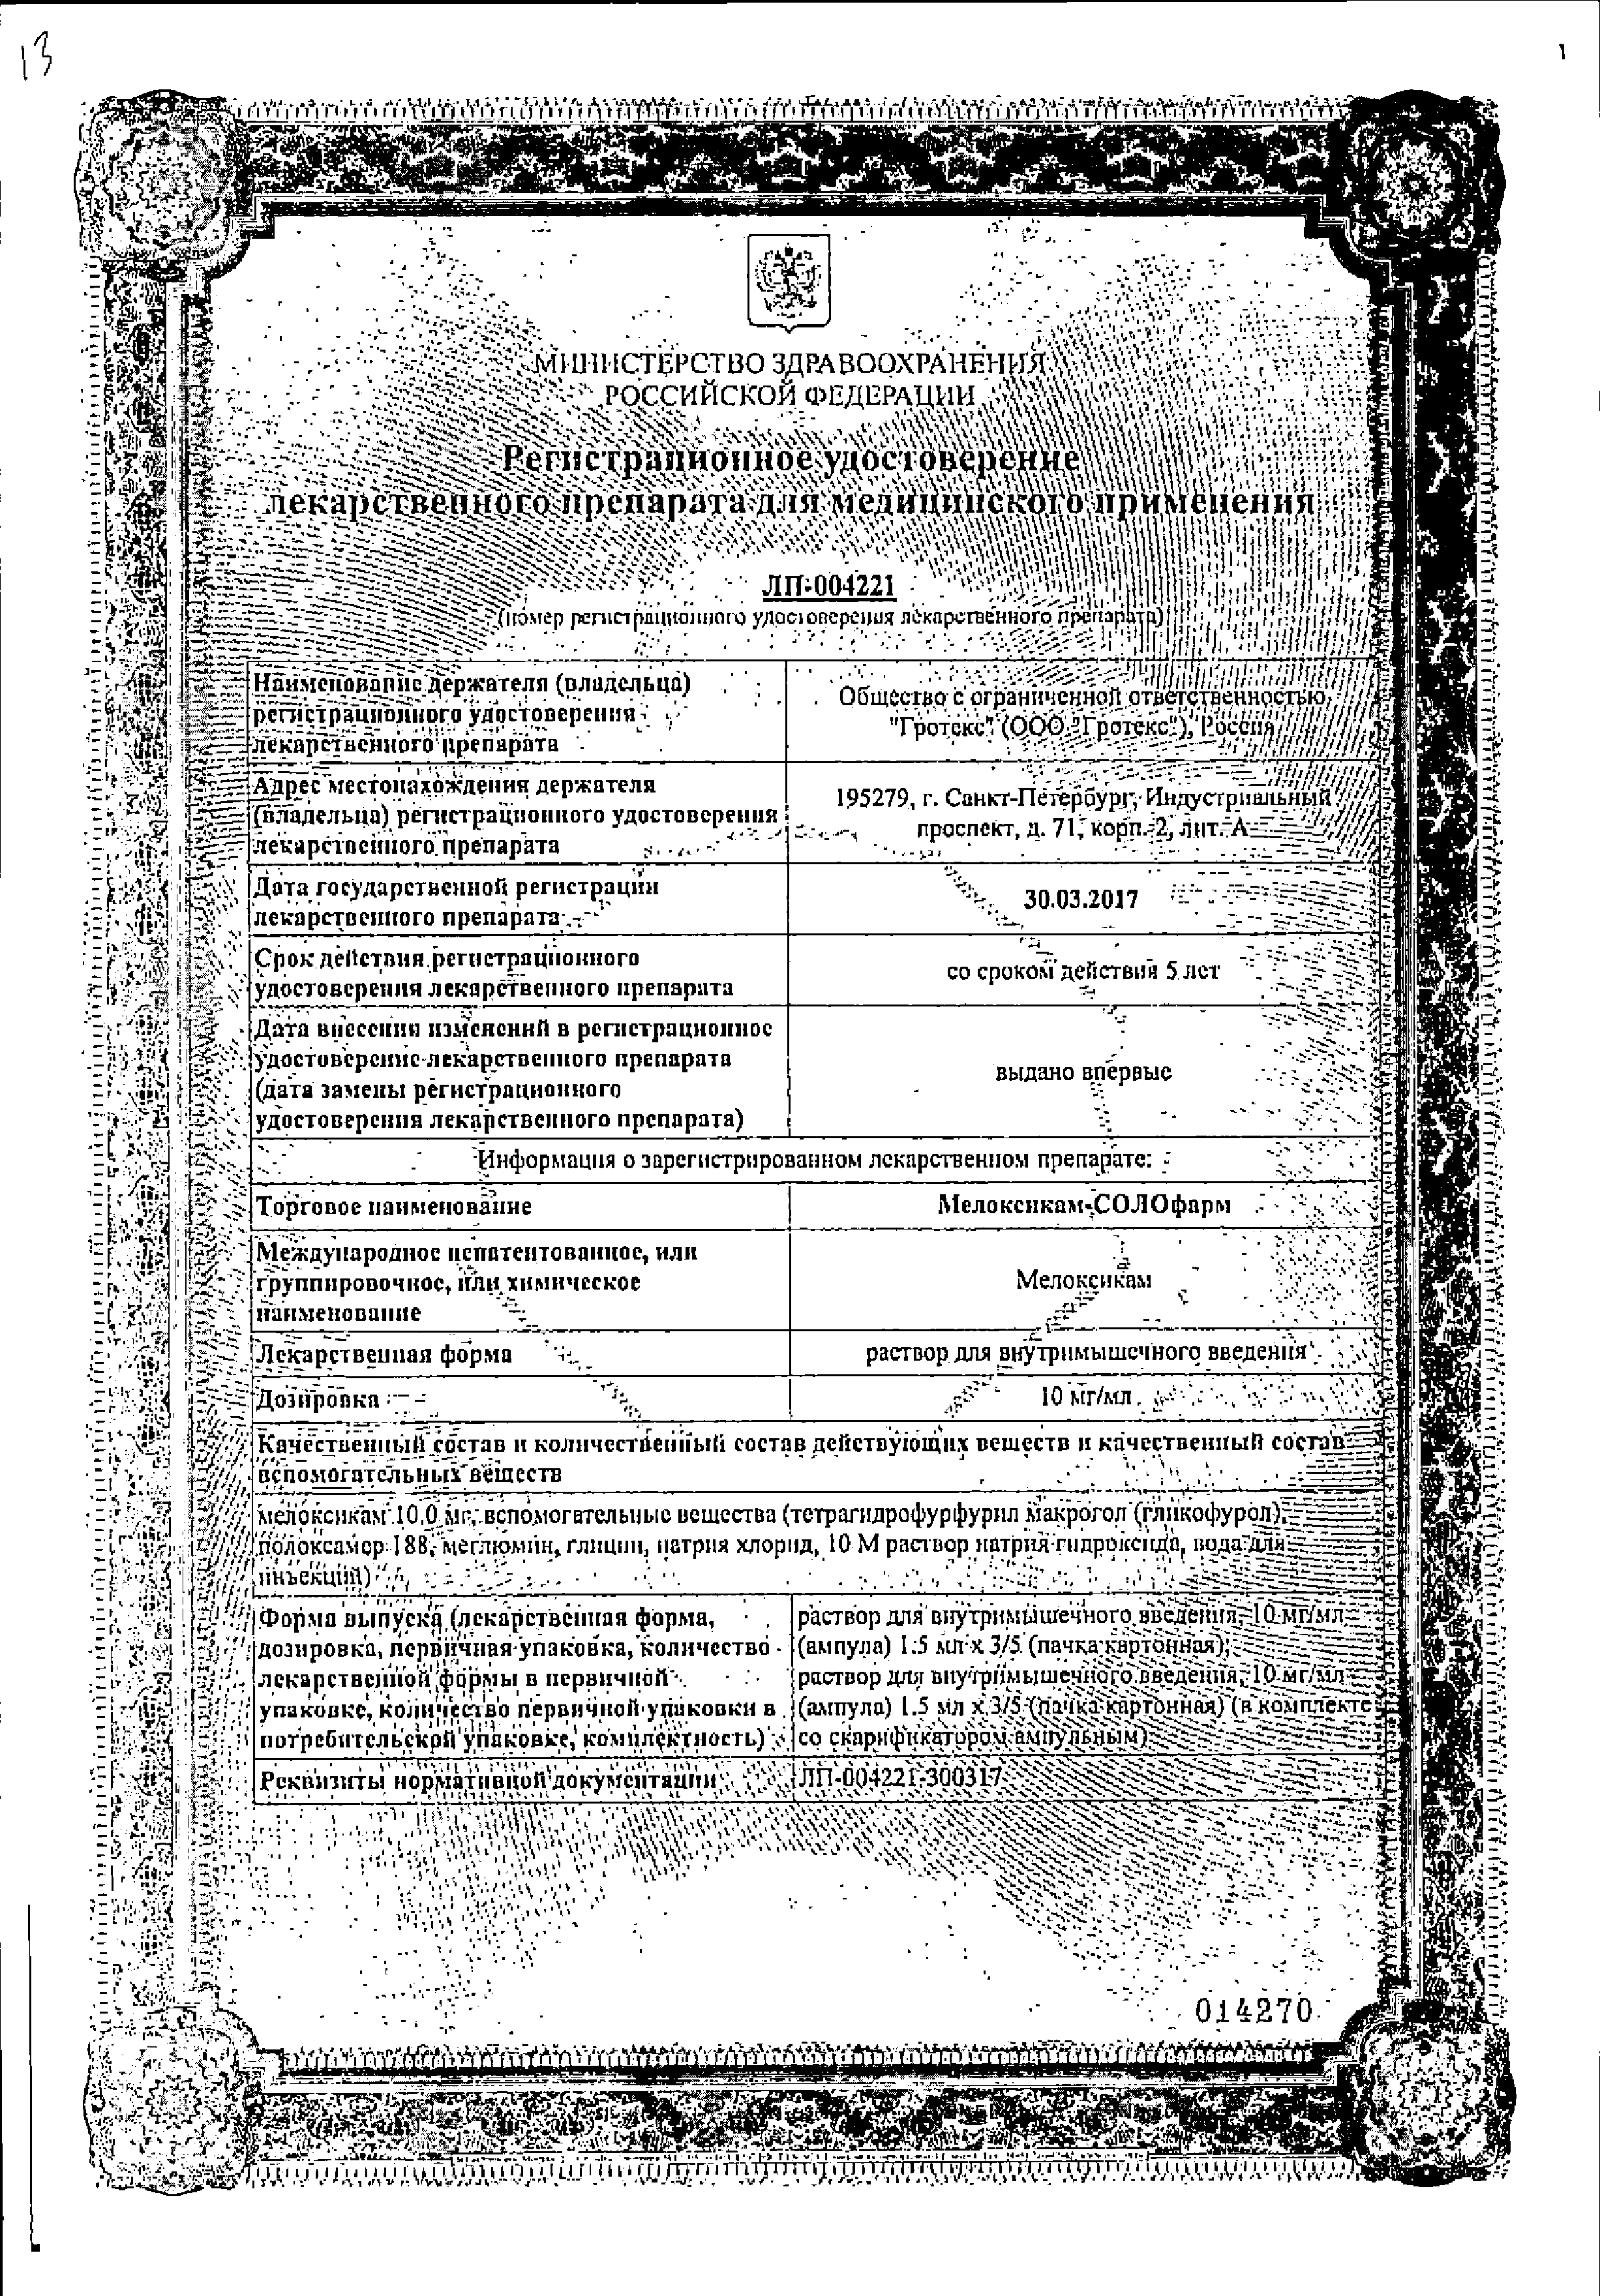 Мелоксикам-Солофарм